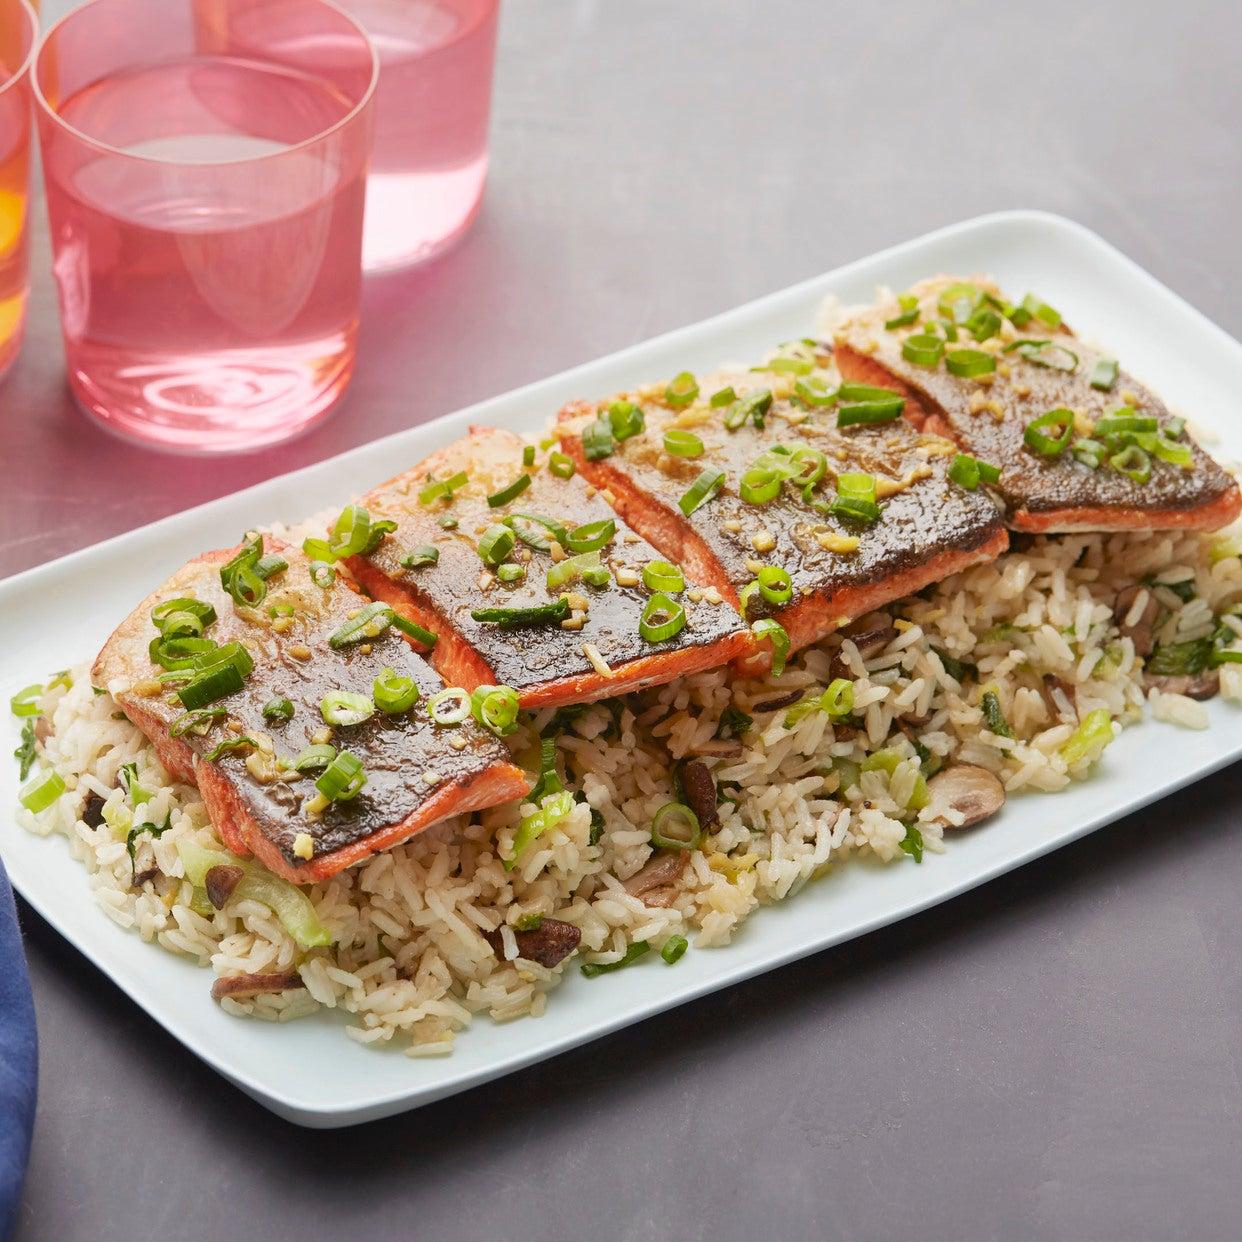 Orange & Soy-Glazed Salmon with Mushroom & Bok Choy Rice